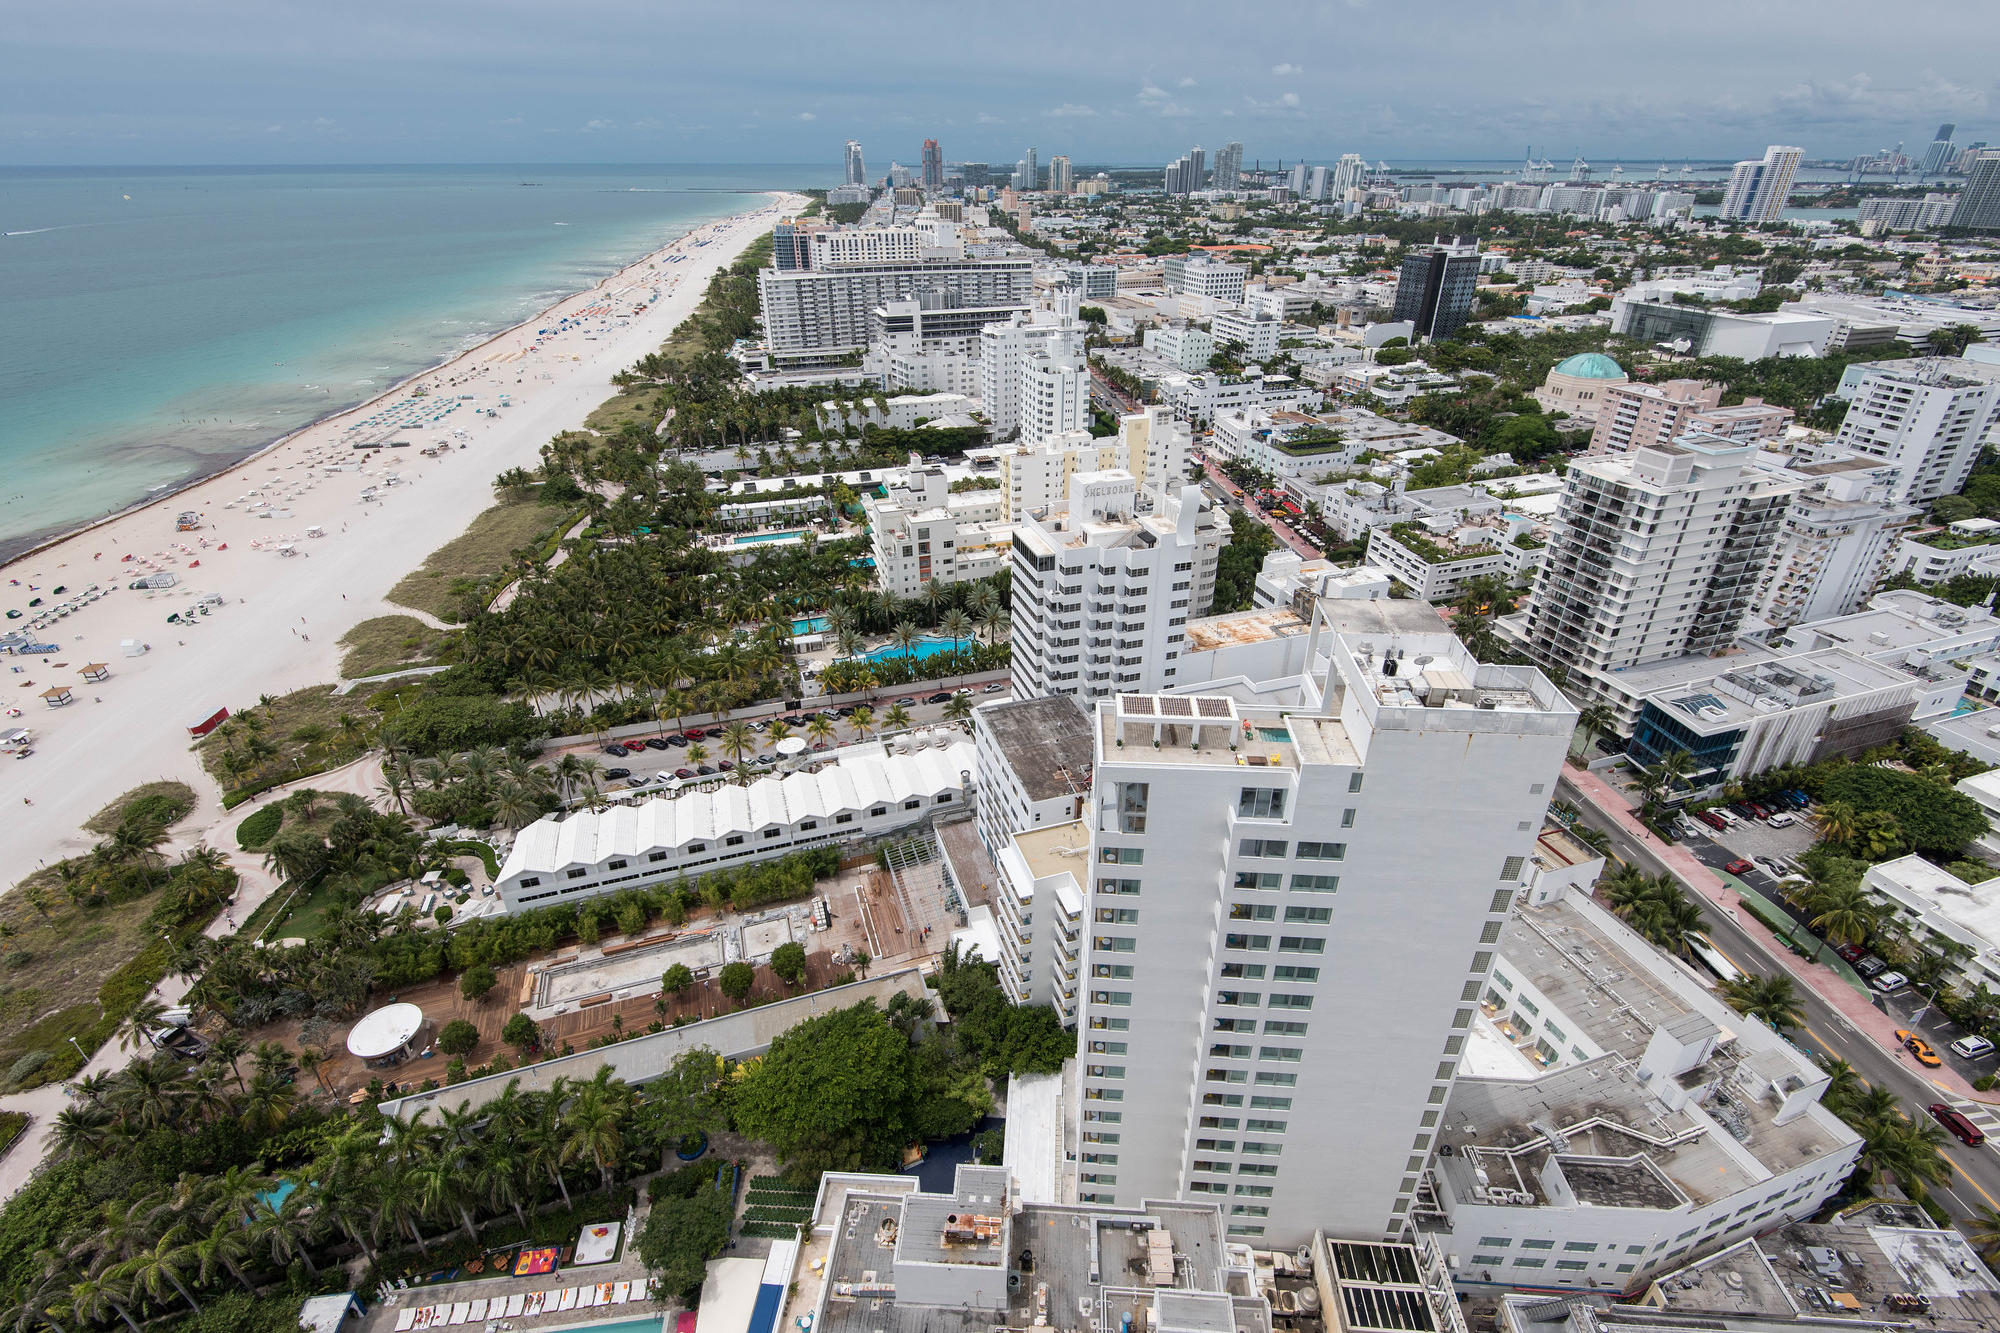 View of South Beach from The Setai Miami Beach